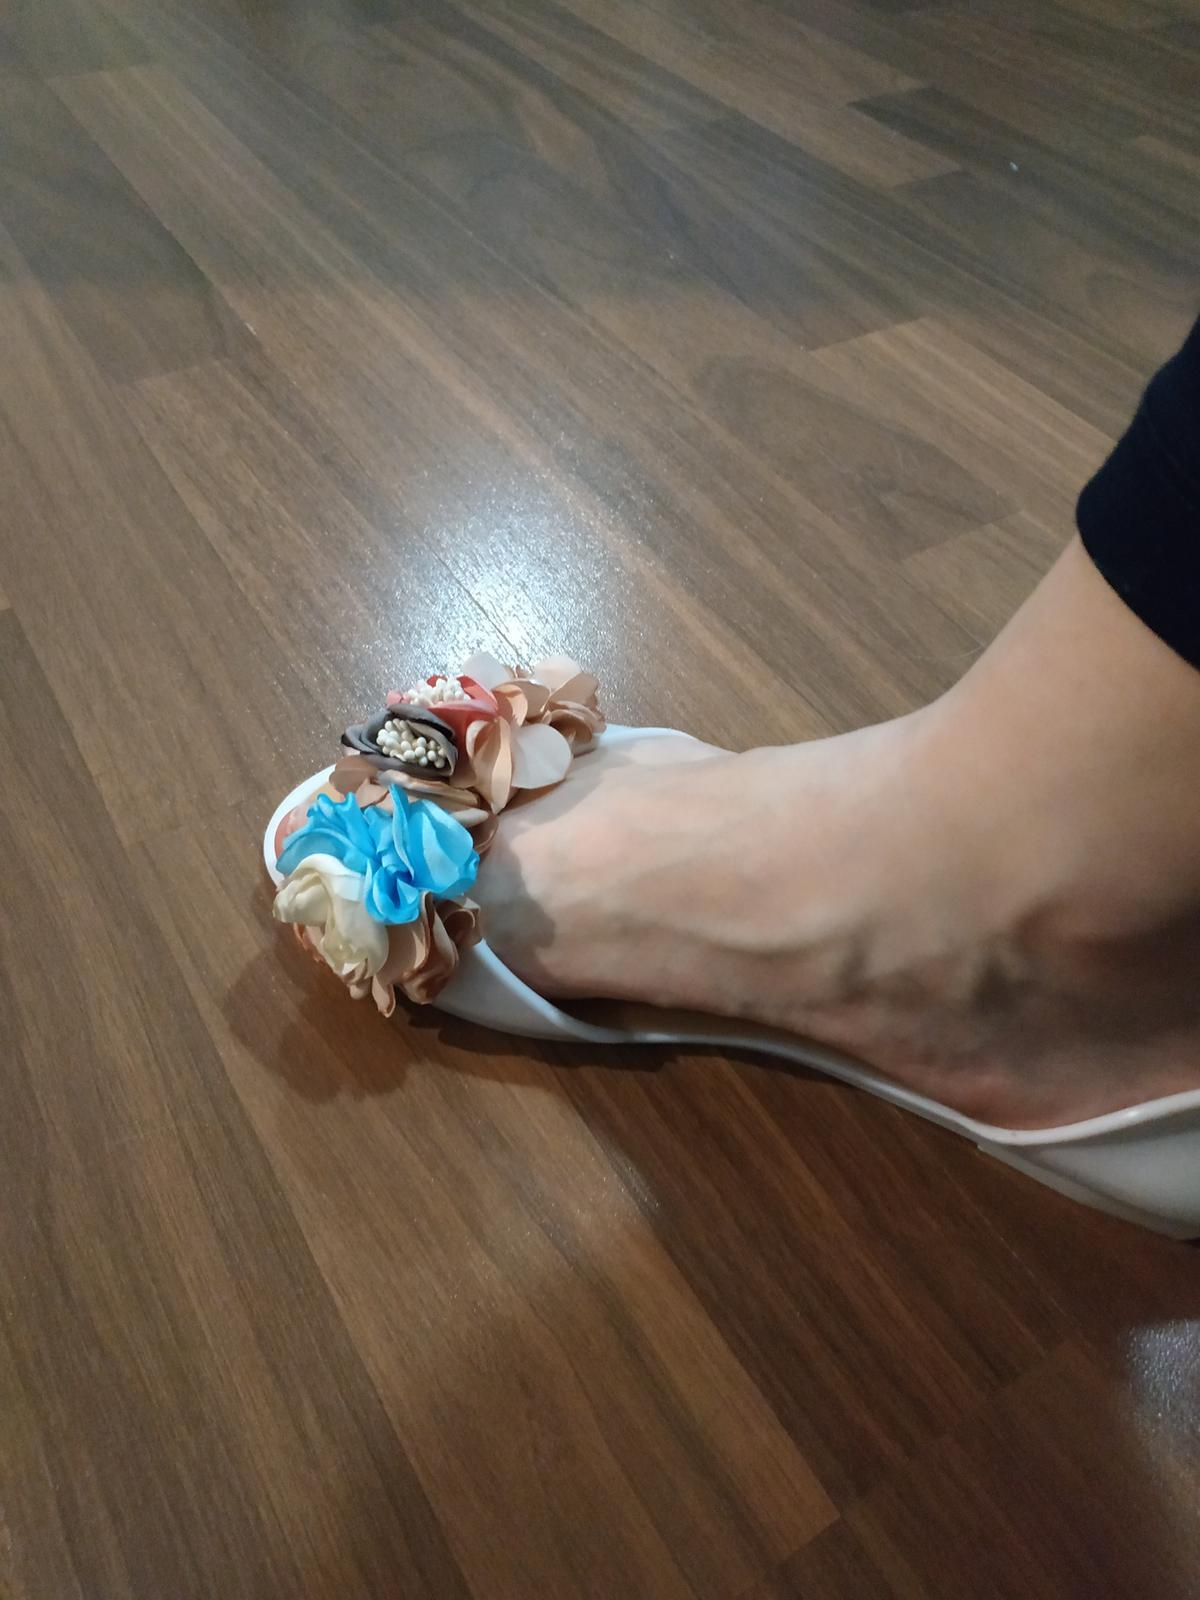 Boty s modrýma kytičkama - Obrázek č. 3